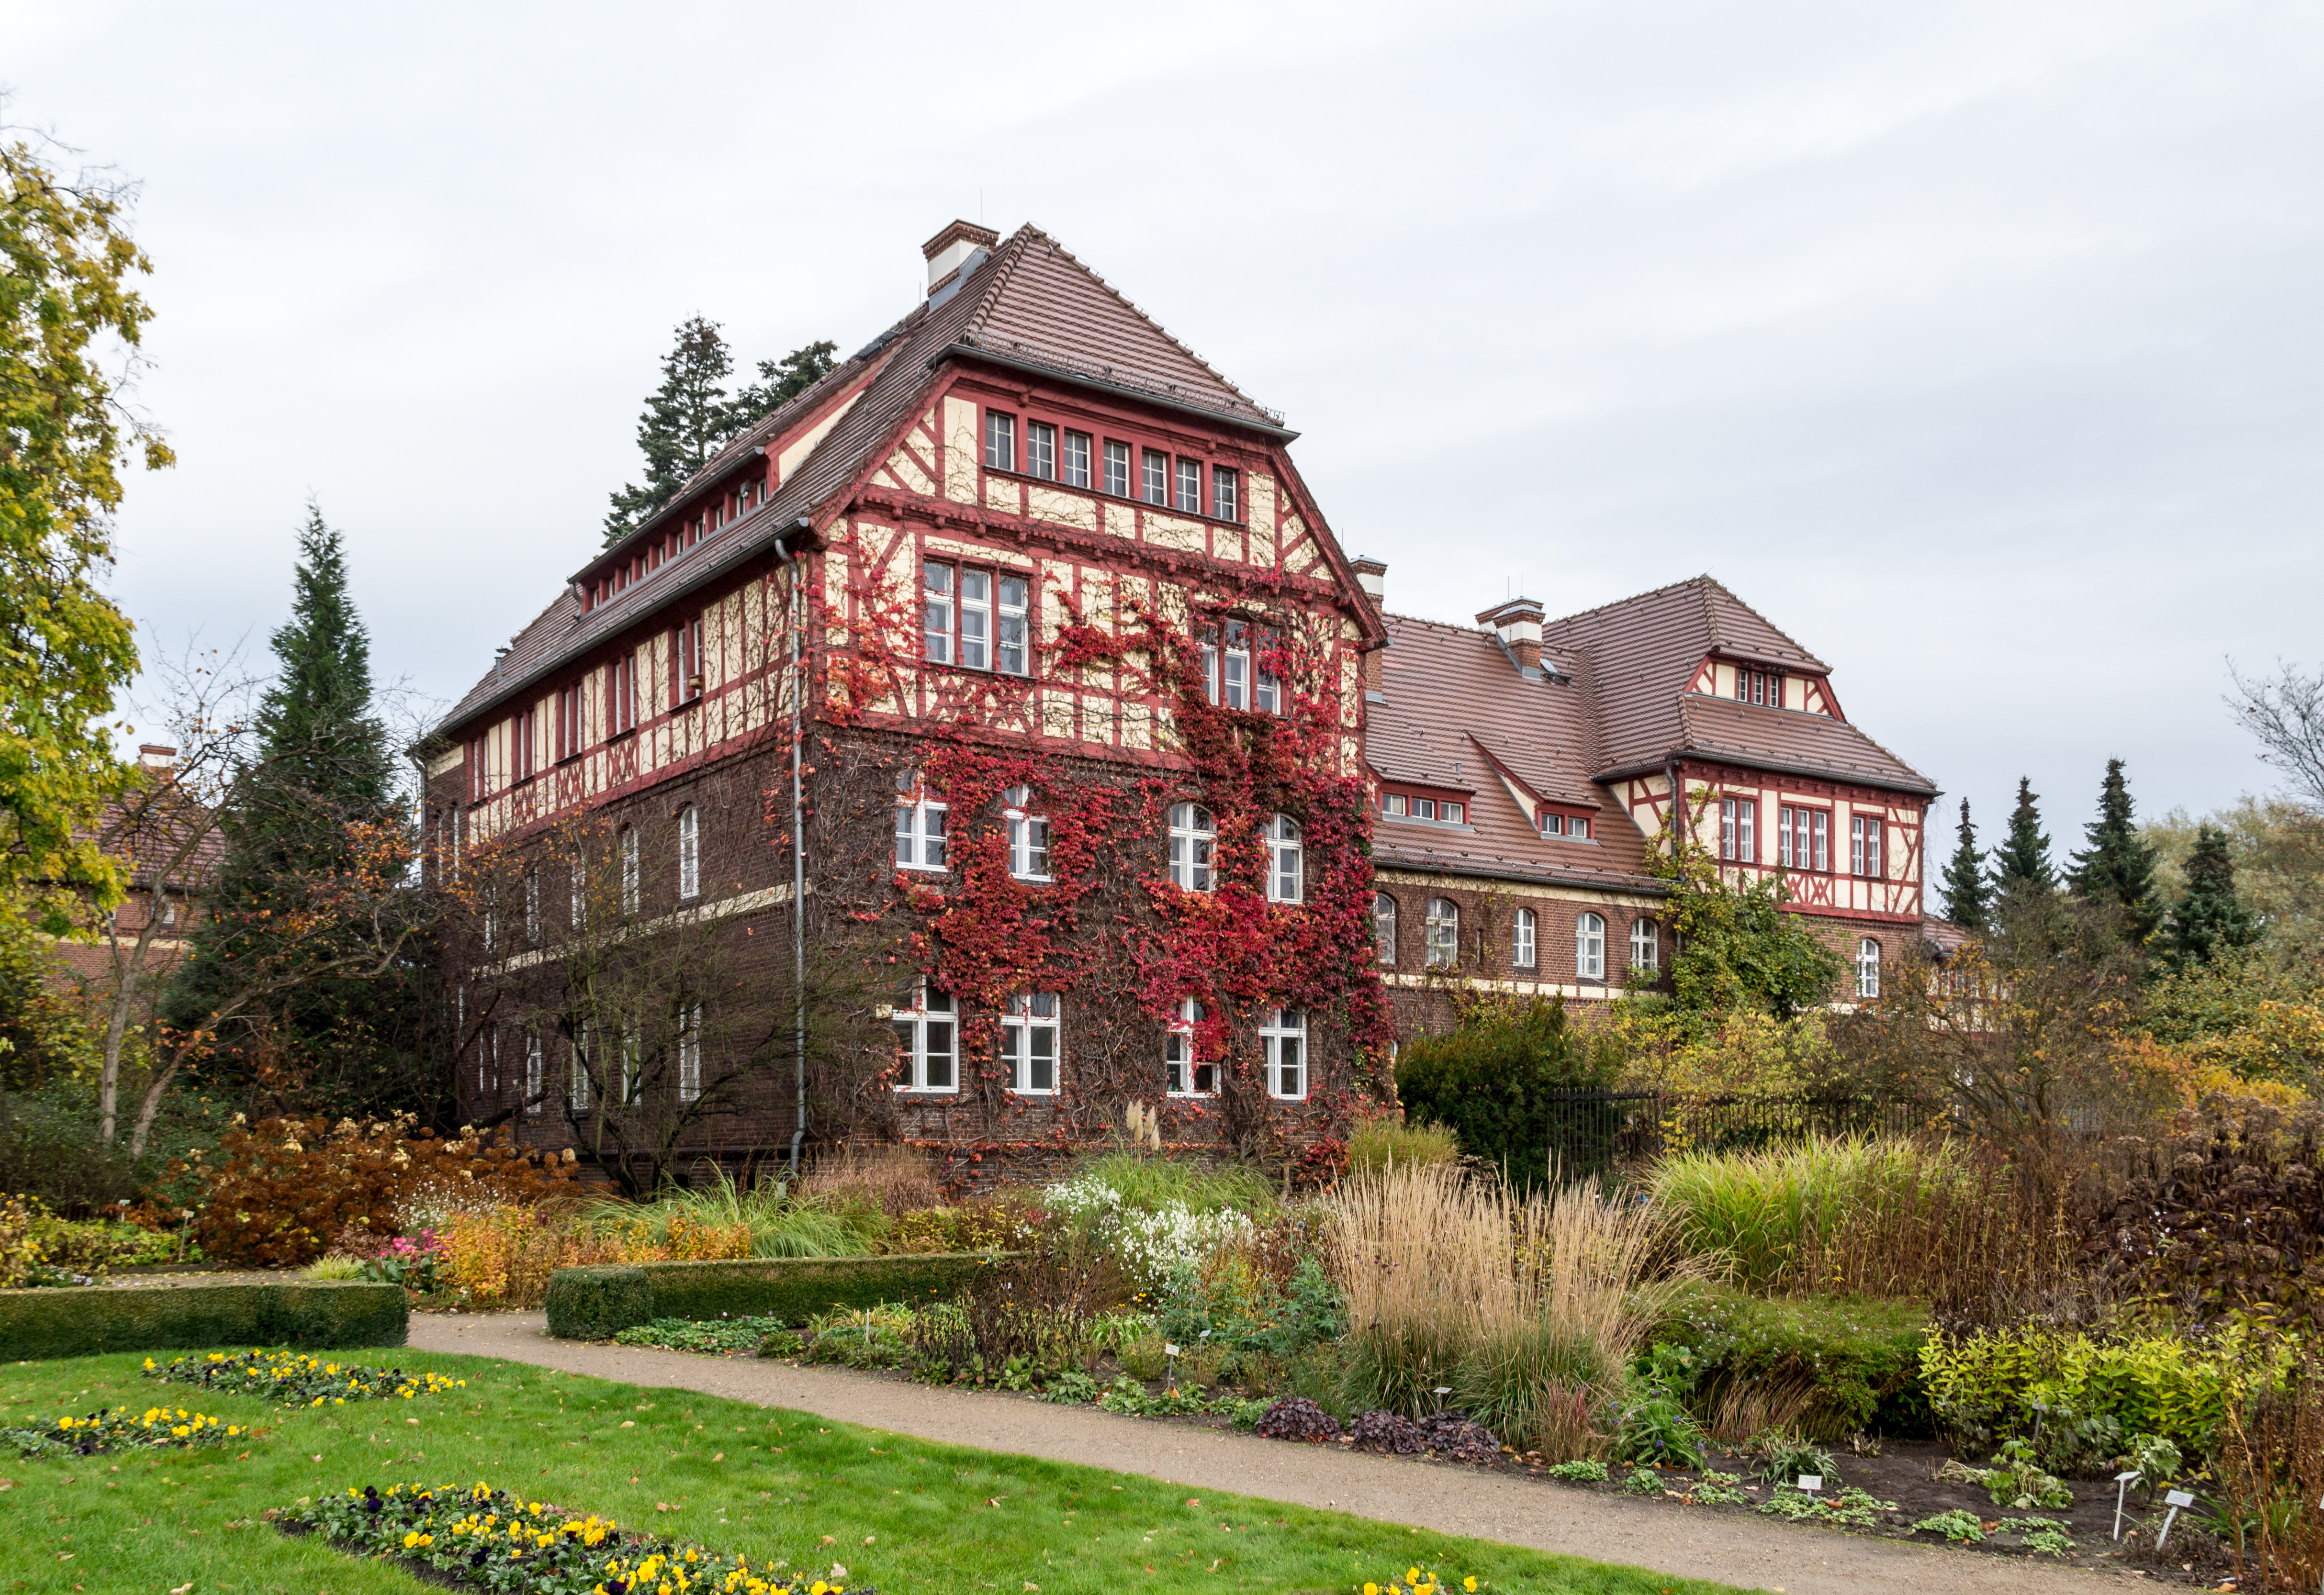 File:Berlin, Botanischer Garten -- 2013 -- 4689.jpg - Wikimedia Commons